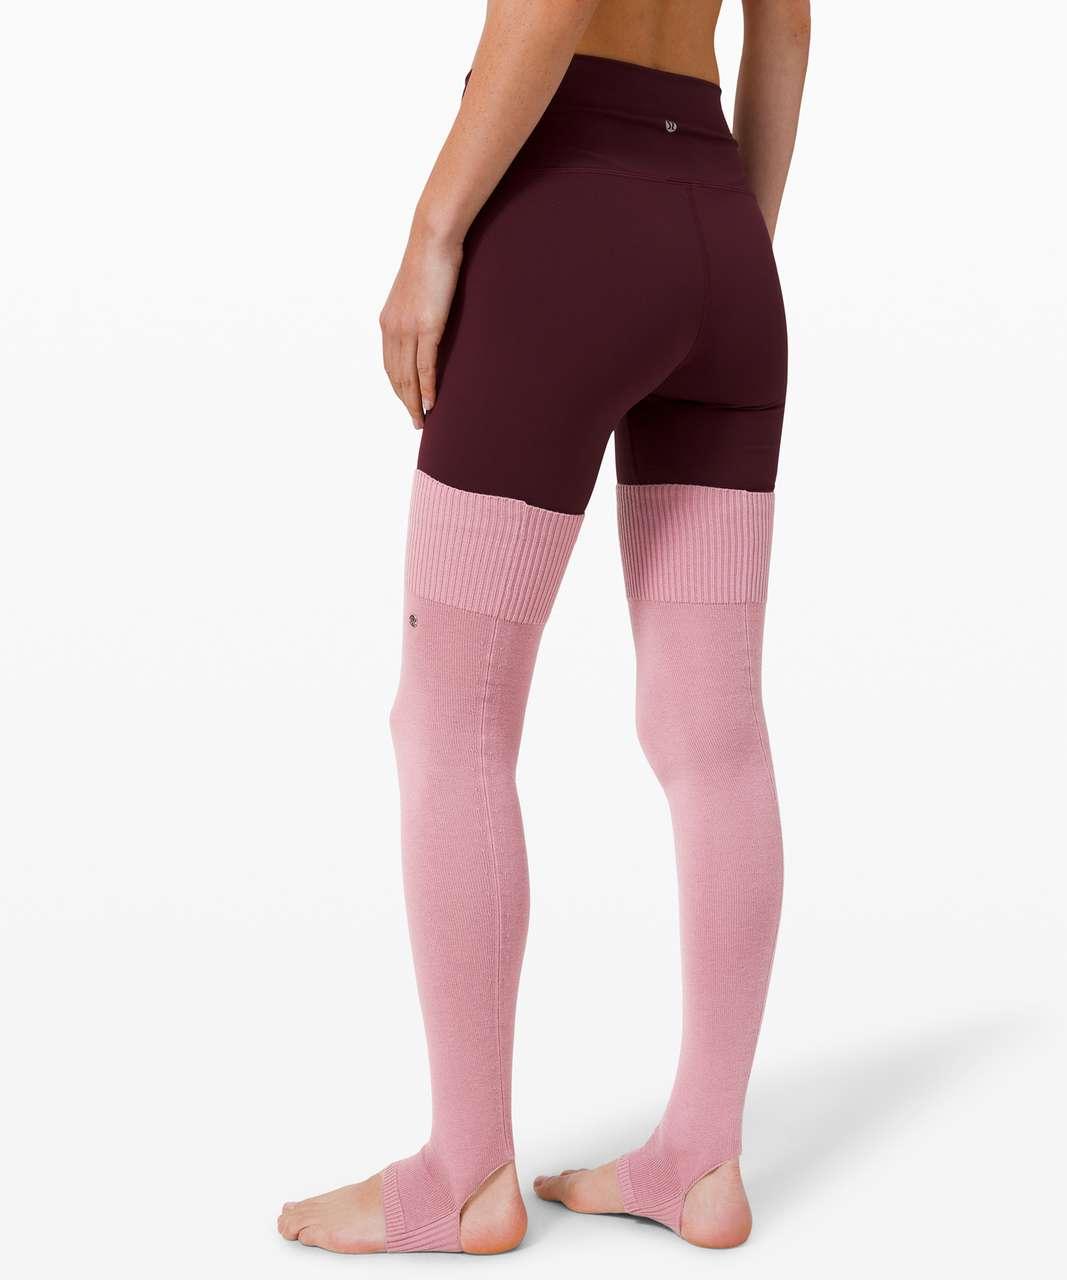 Lululemon Evolution Leg Warmer - Pink Taupe